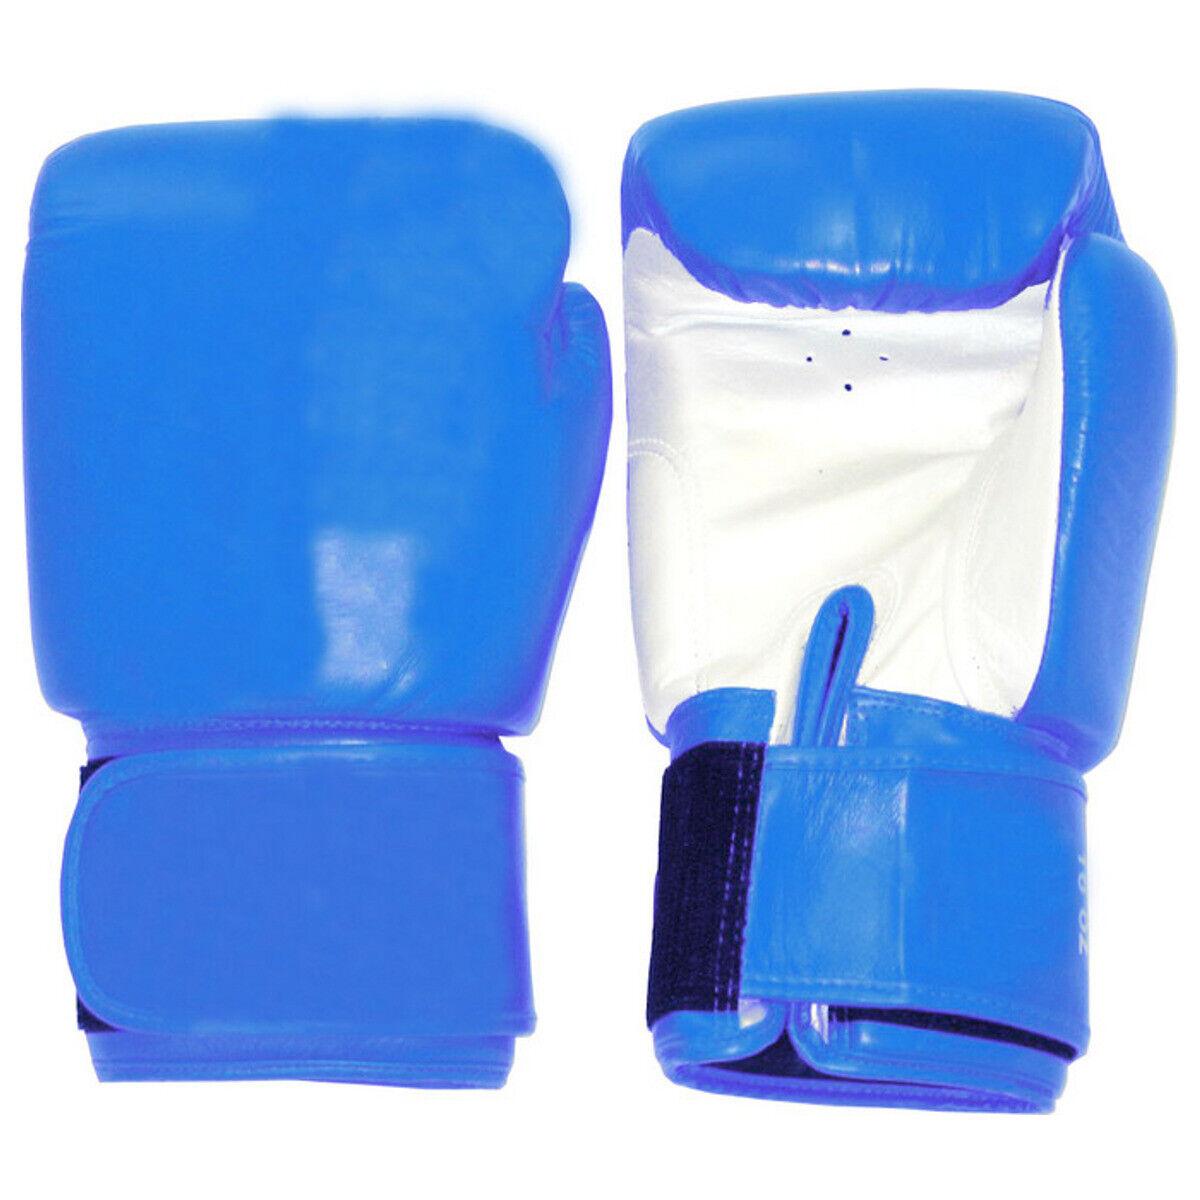 Boxhandschuhe blau-weiß Leder TIGER  Sparring -  Thaiboxen - Boxen -   10 -16 oz